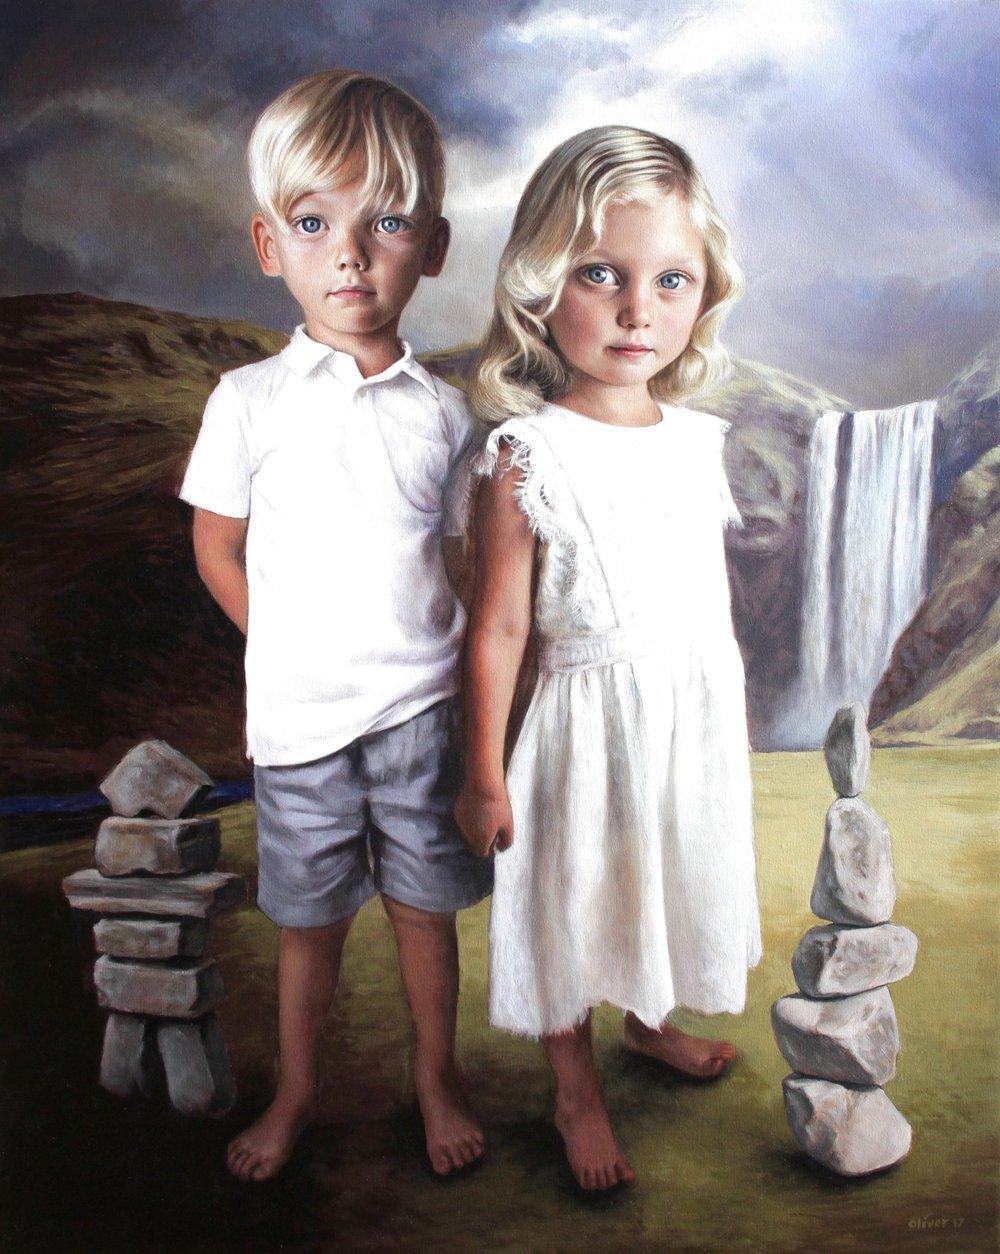 """Lochlan & Margot Fifth"" by Richard J. Oliver"